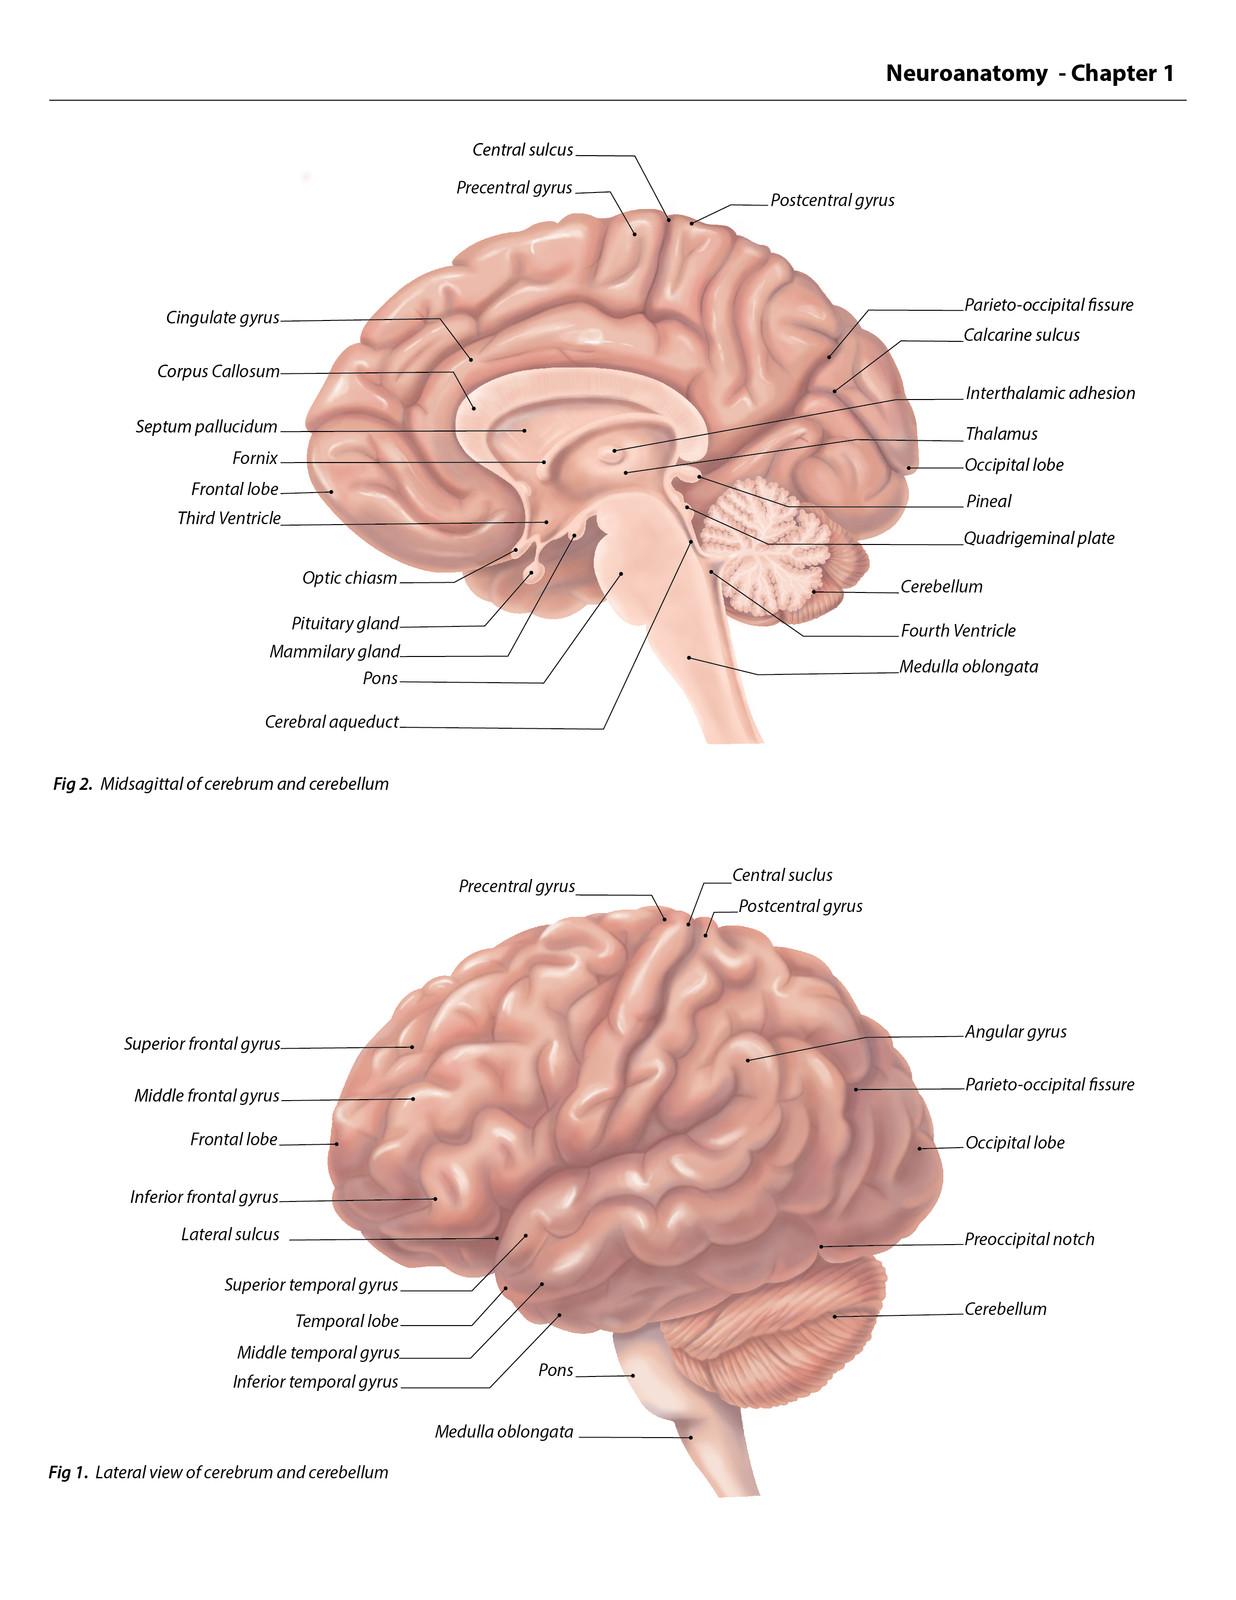 Cerebrum and Cerebellum of a Human Brain | Biomedical Illustrator ...